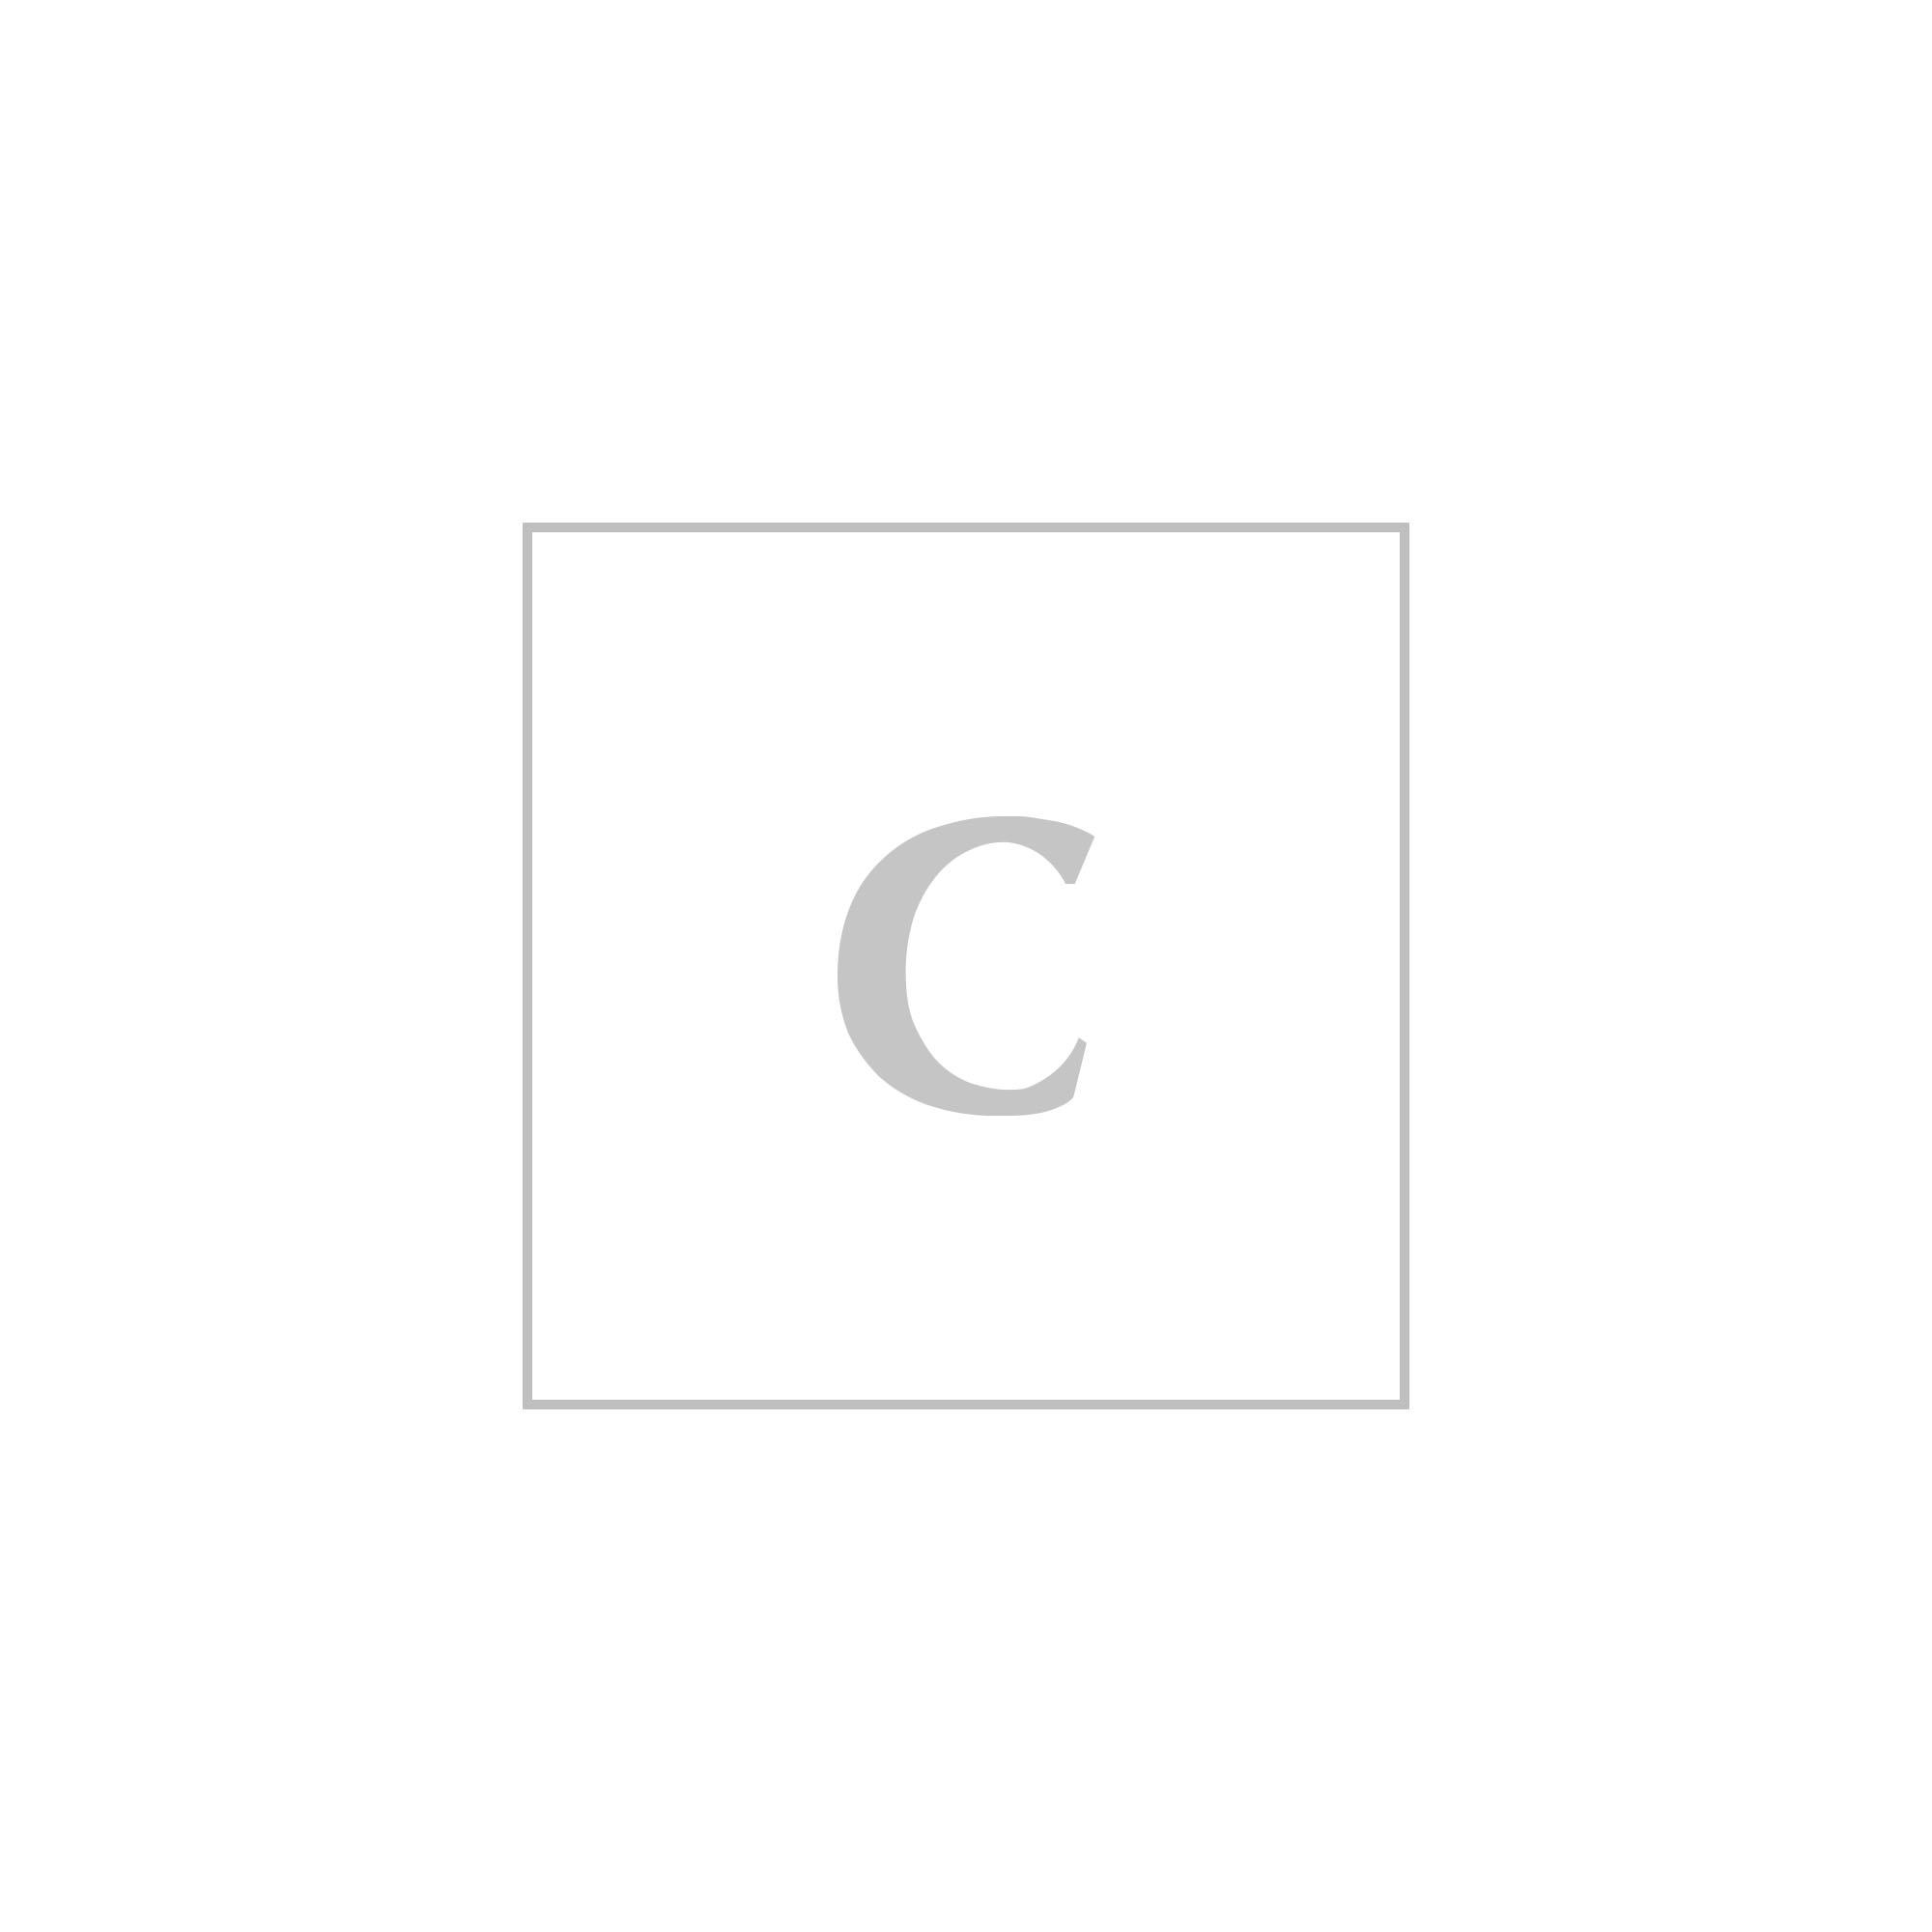 Versace croc-print leather cardholder